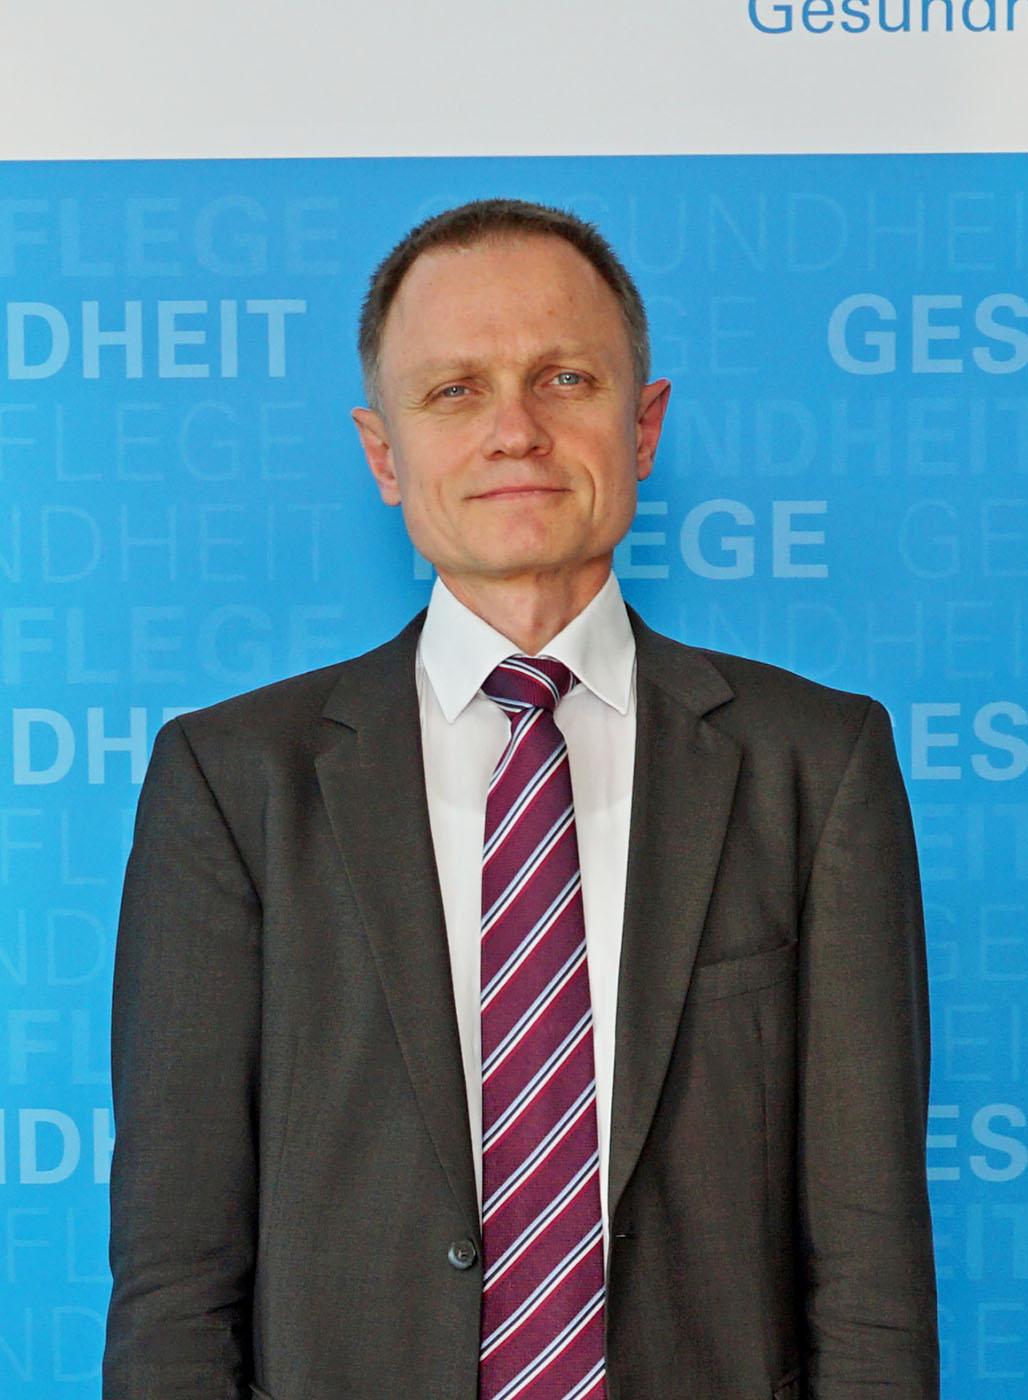 Prof. Dr. Oliver Pogarell - PID-Ethikkommission